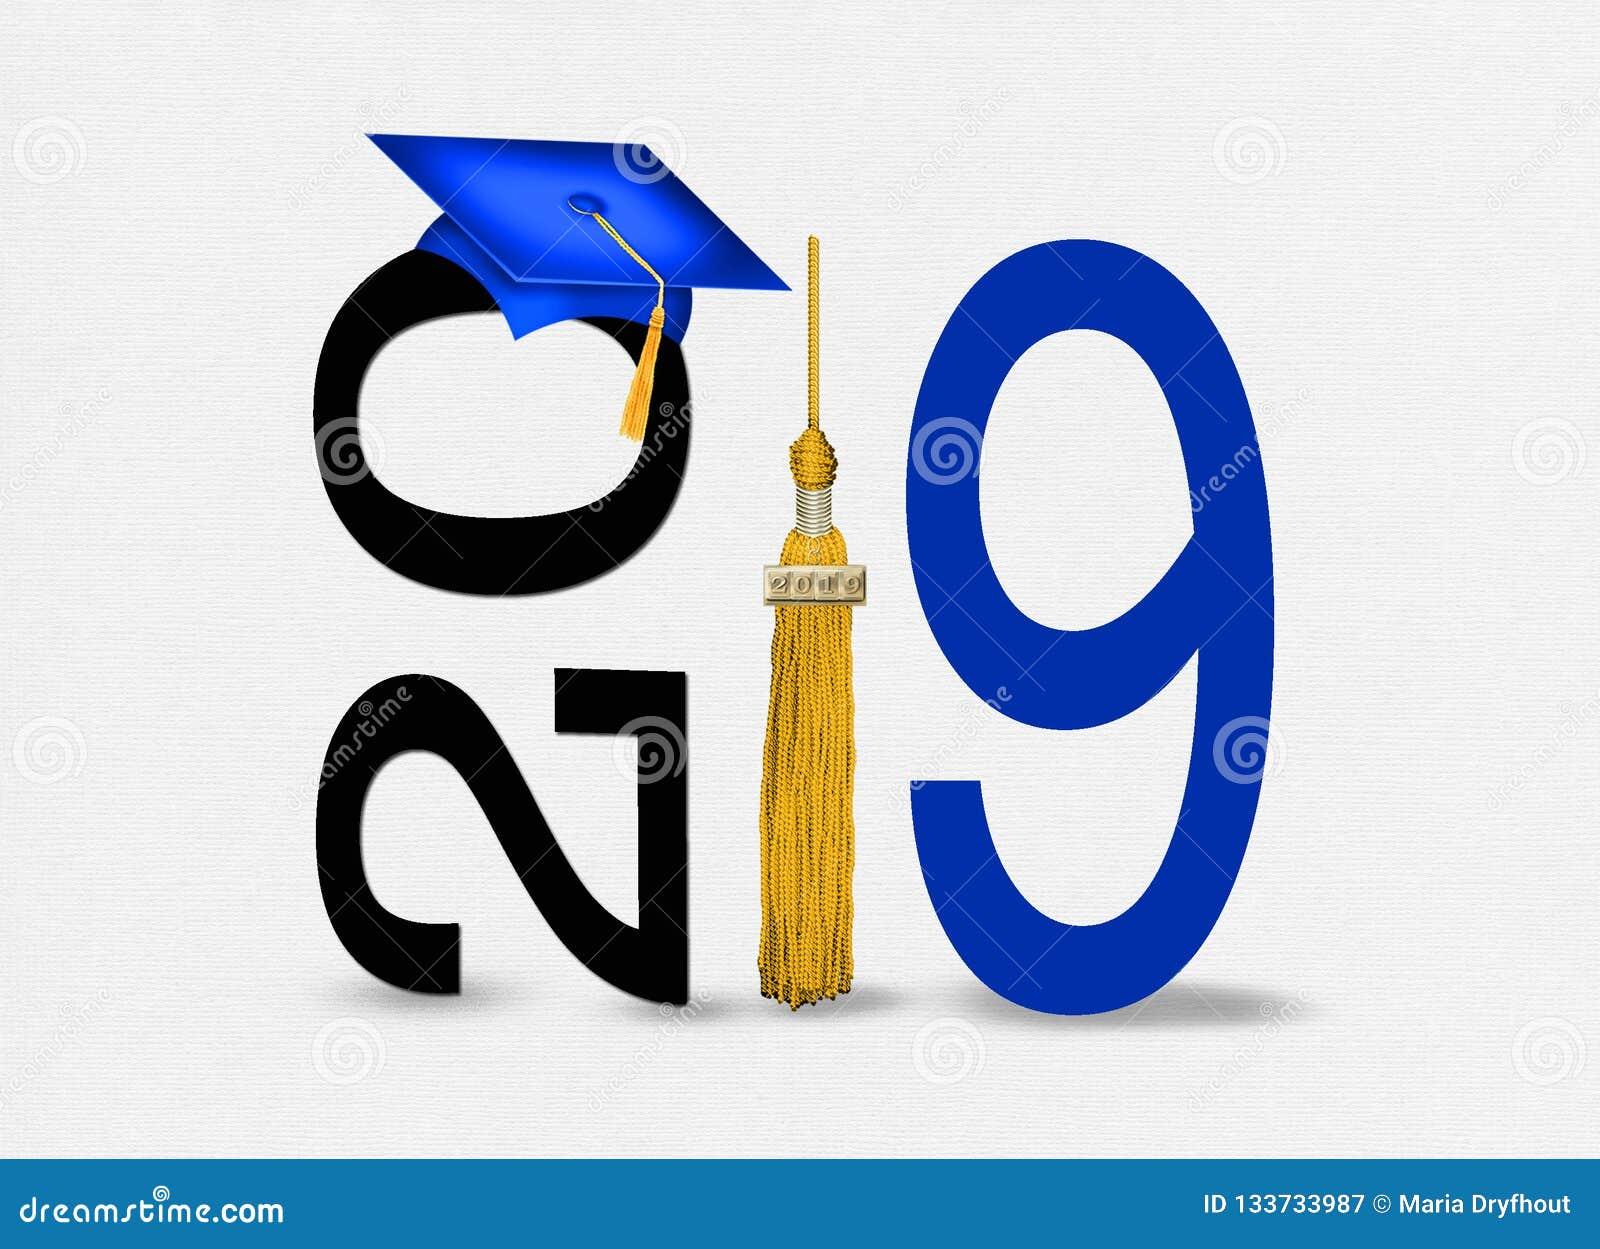 Blue 2019 Graduation Cap With Gold Tassel Stock ...